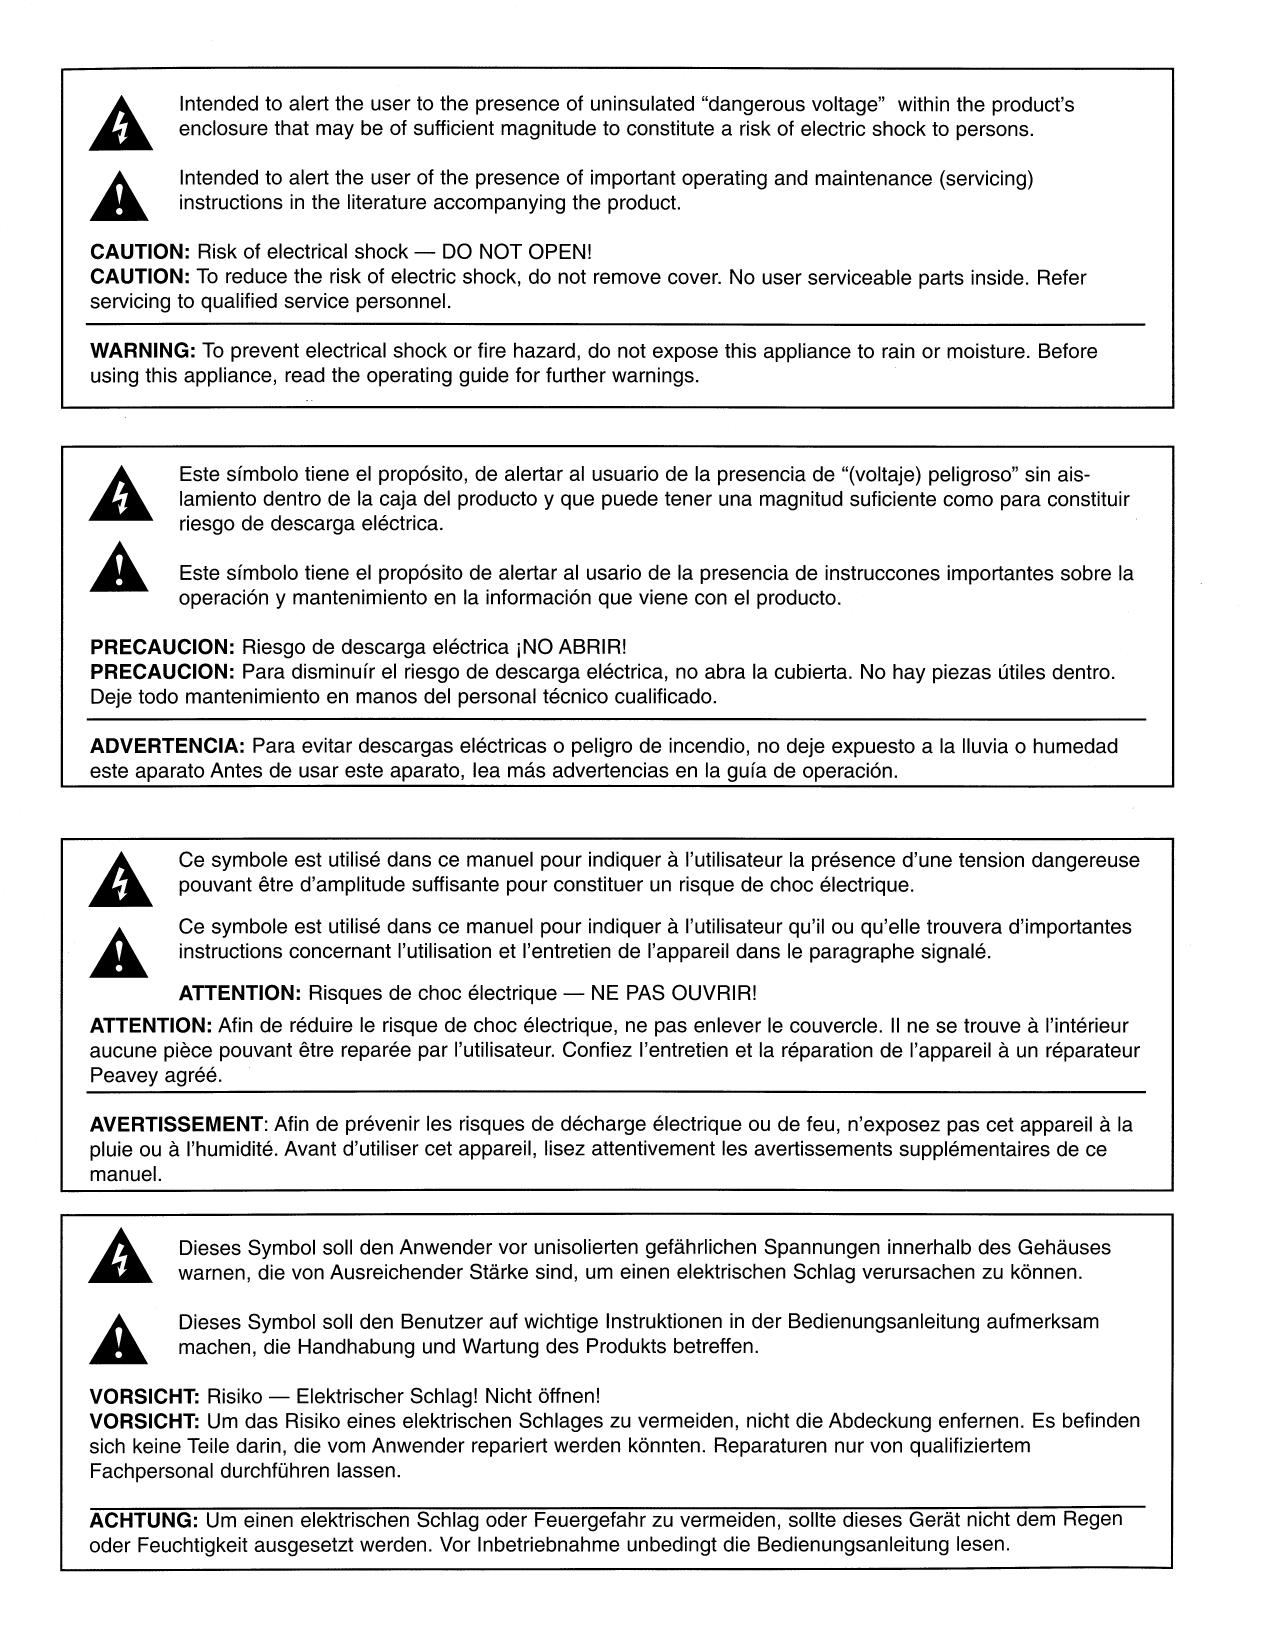 Wunderbar Automobilschema Symbole Ideen - Verdrahtungsideen - korsmi ...